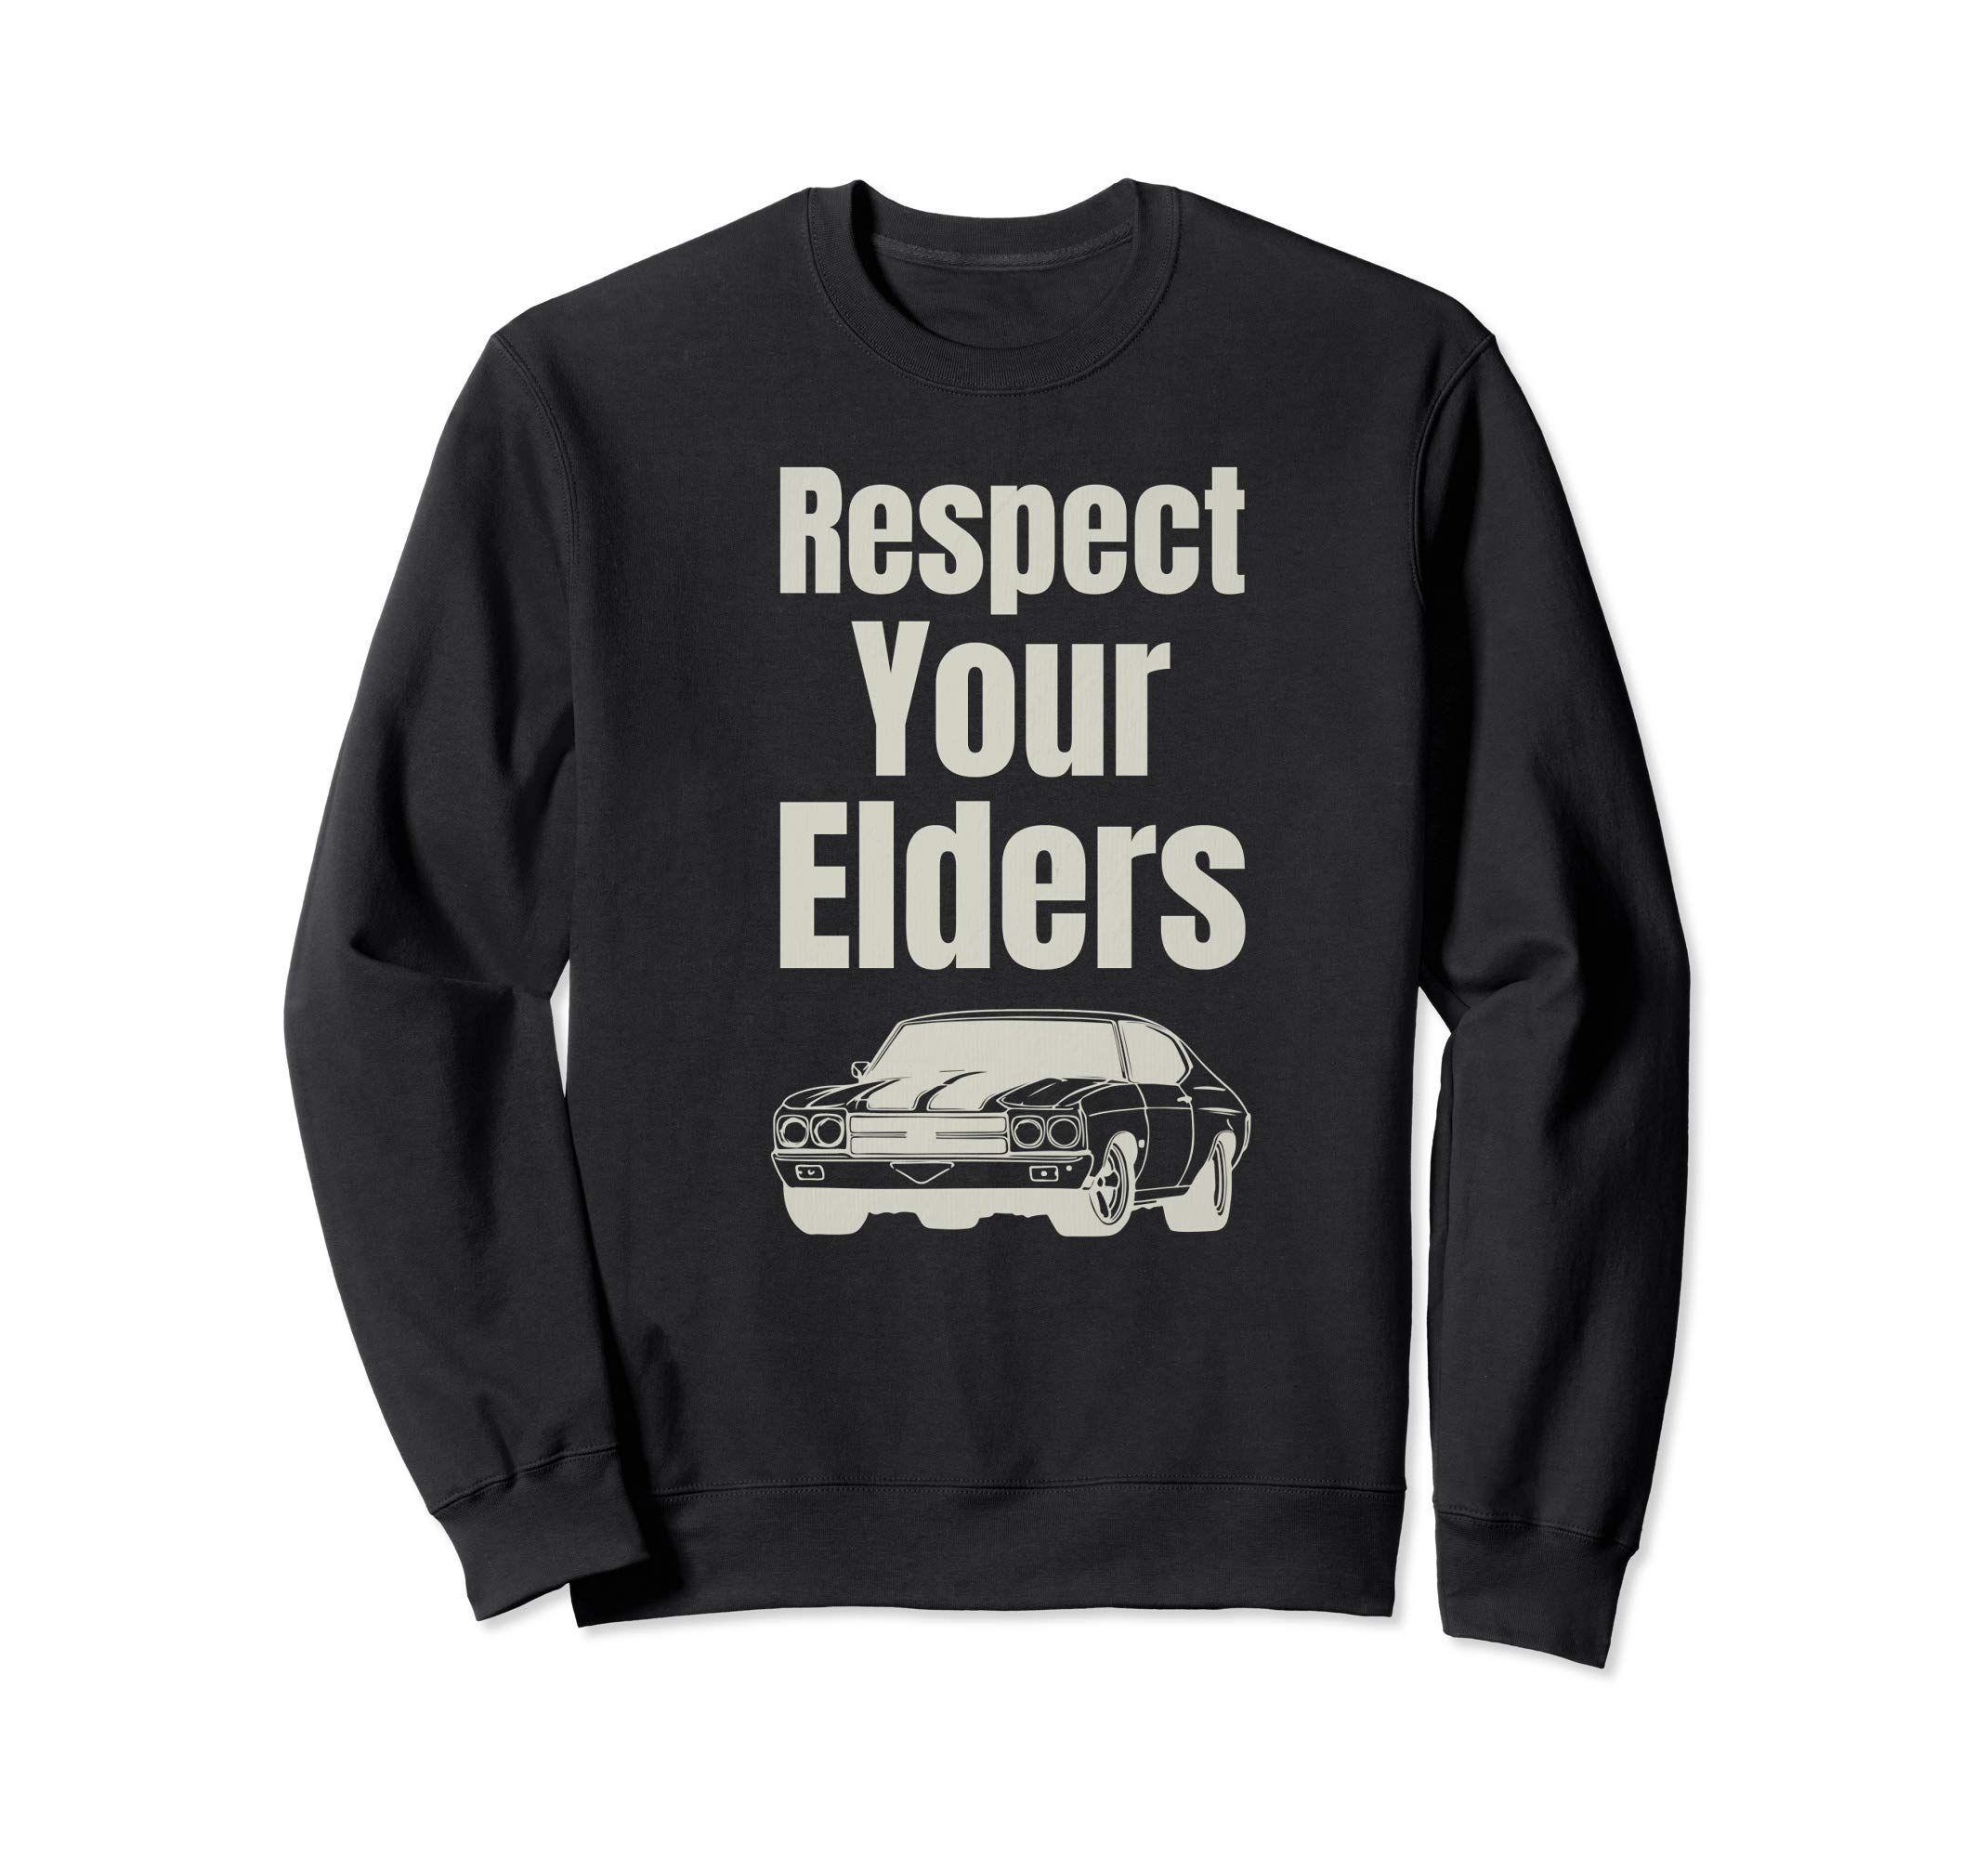 Vintage Muscle Car Guy Sweatshirt Gift Classic Car Fanatic-Colonhue#car #classic #fanaticcolonhue #gift #guy #muscle #sweatshirt #vintage